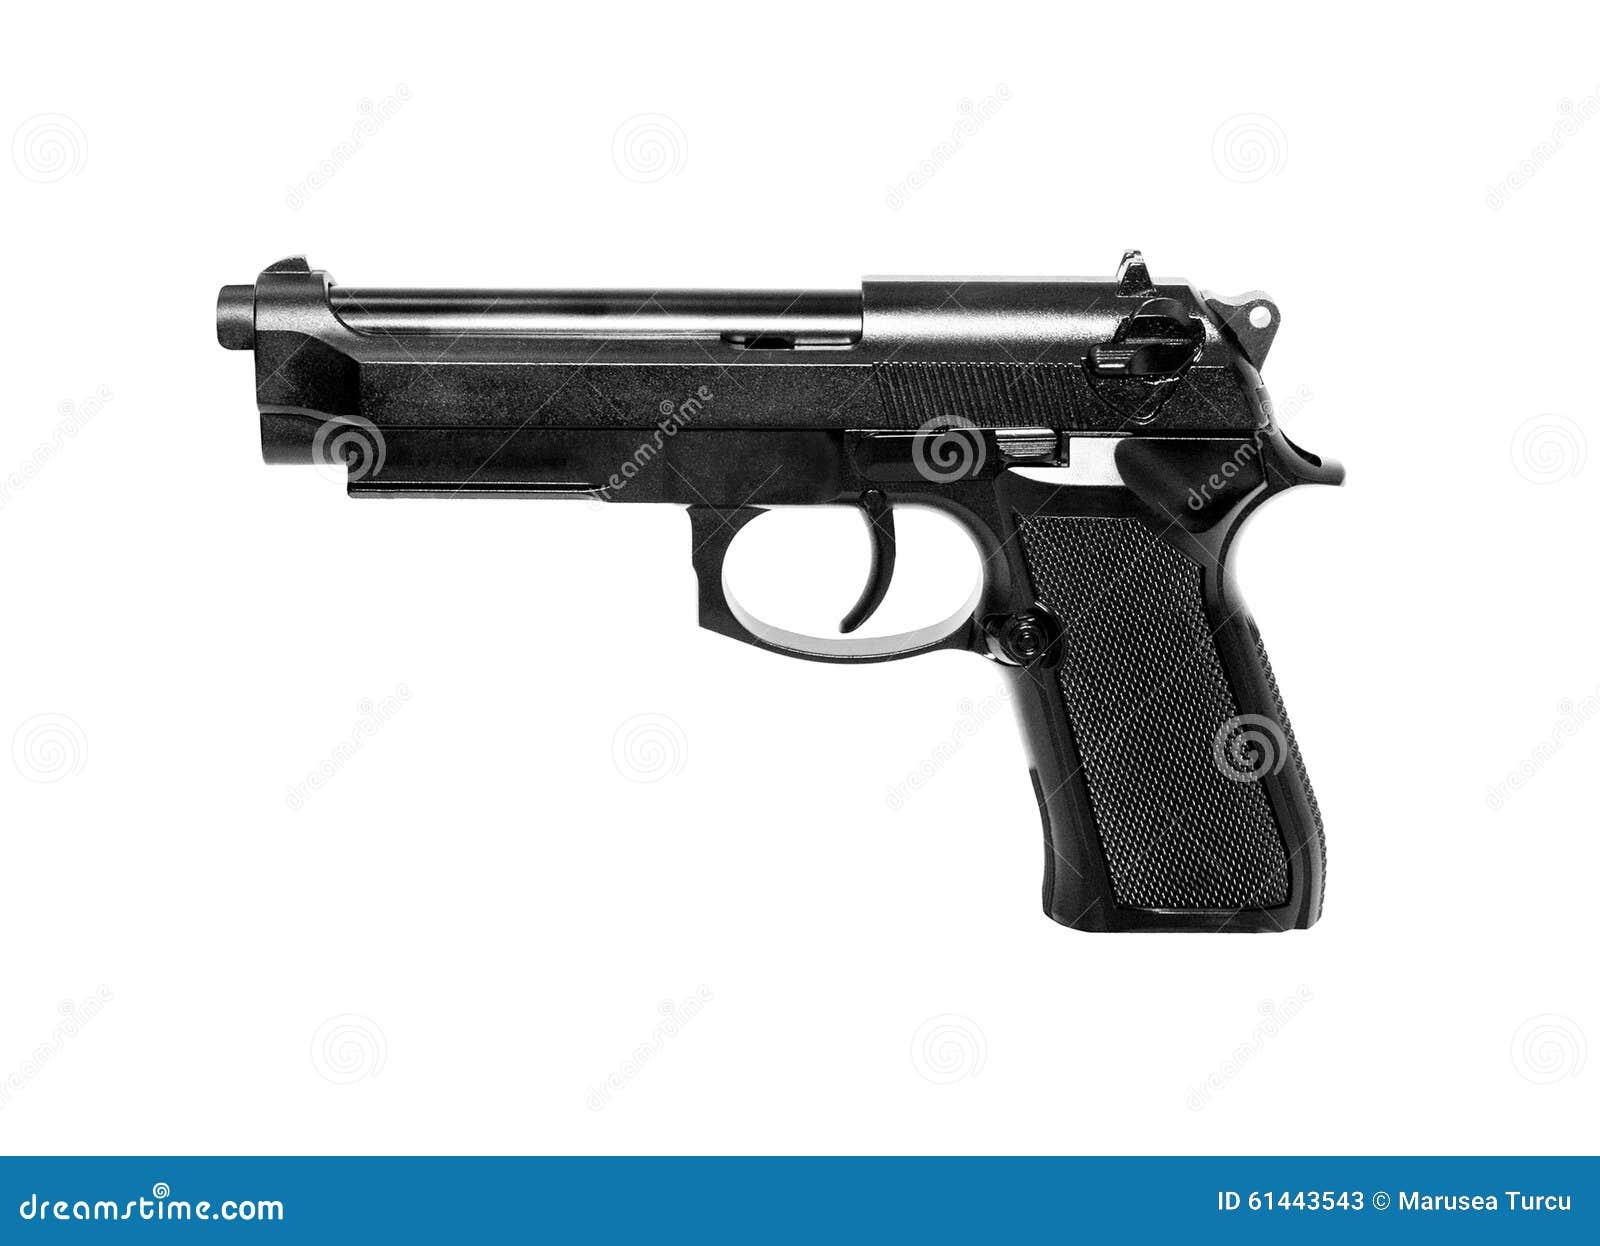 gun white background - photo #7